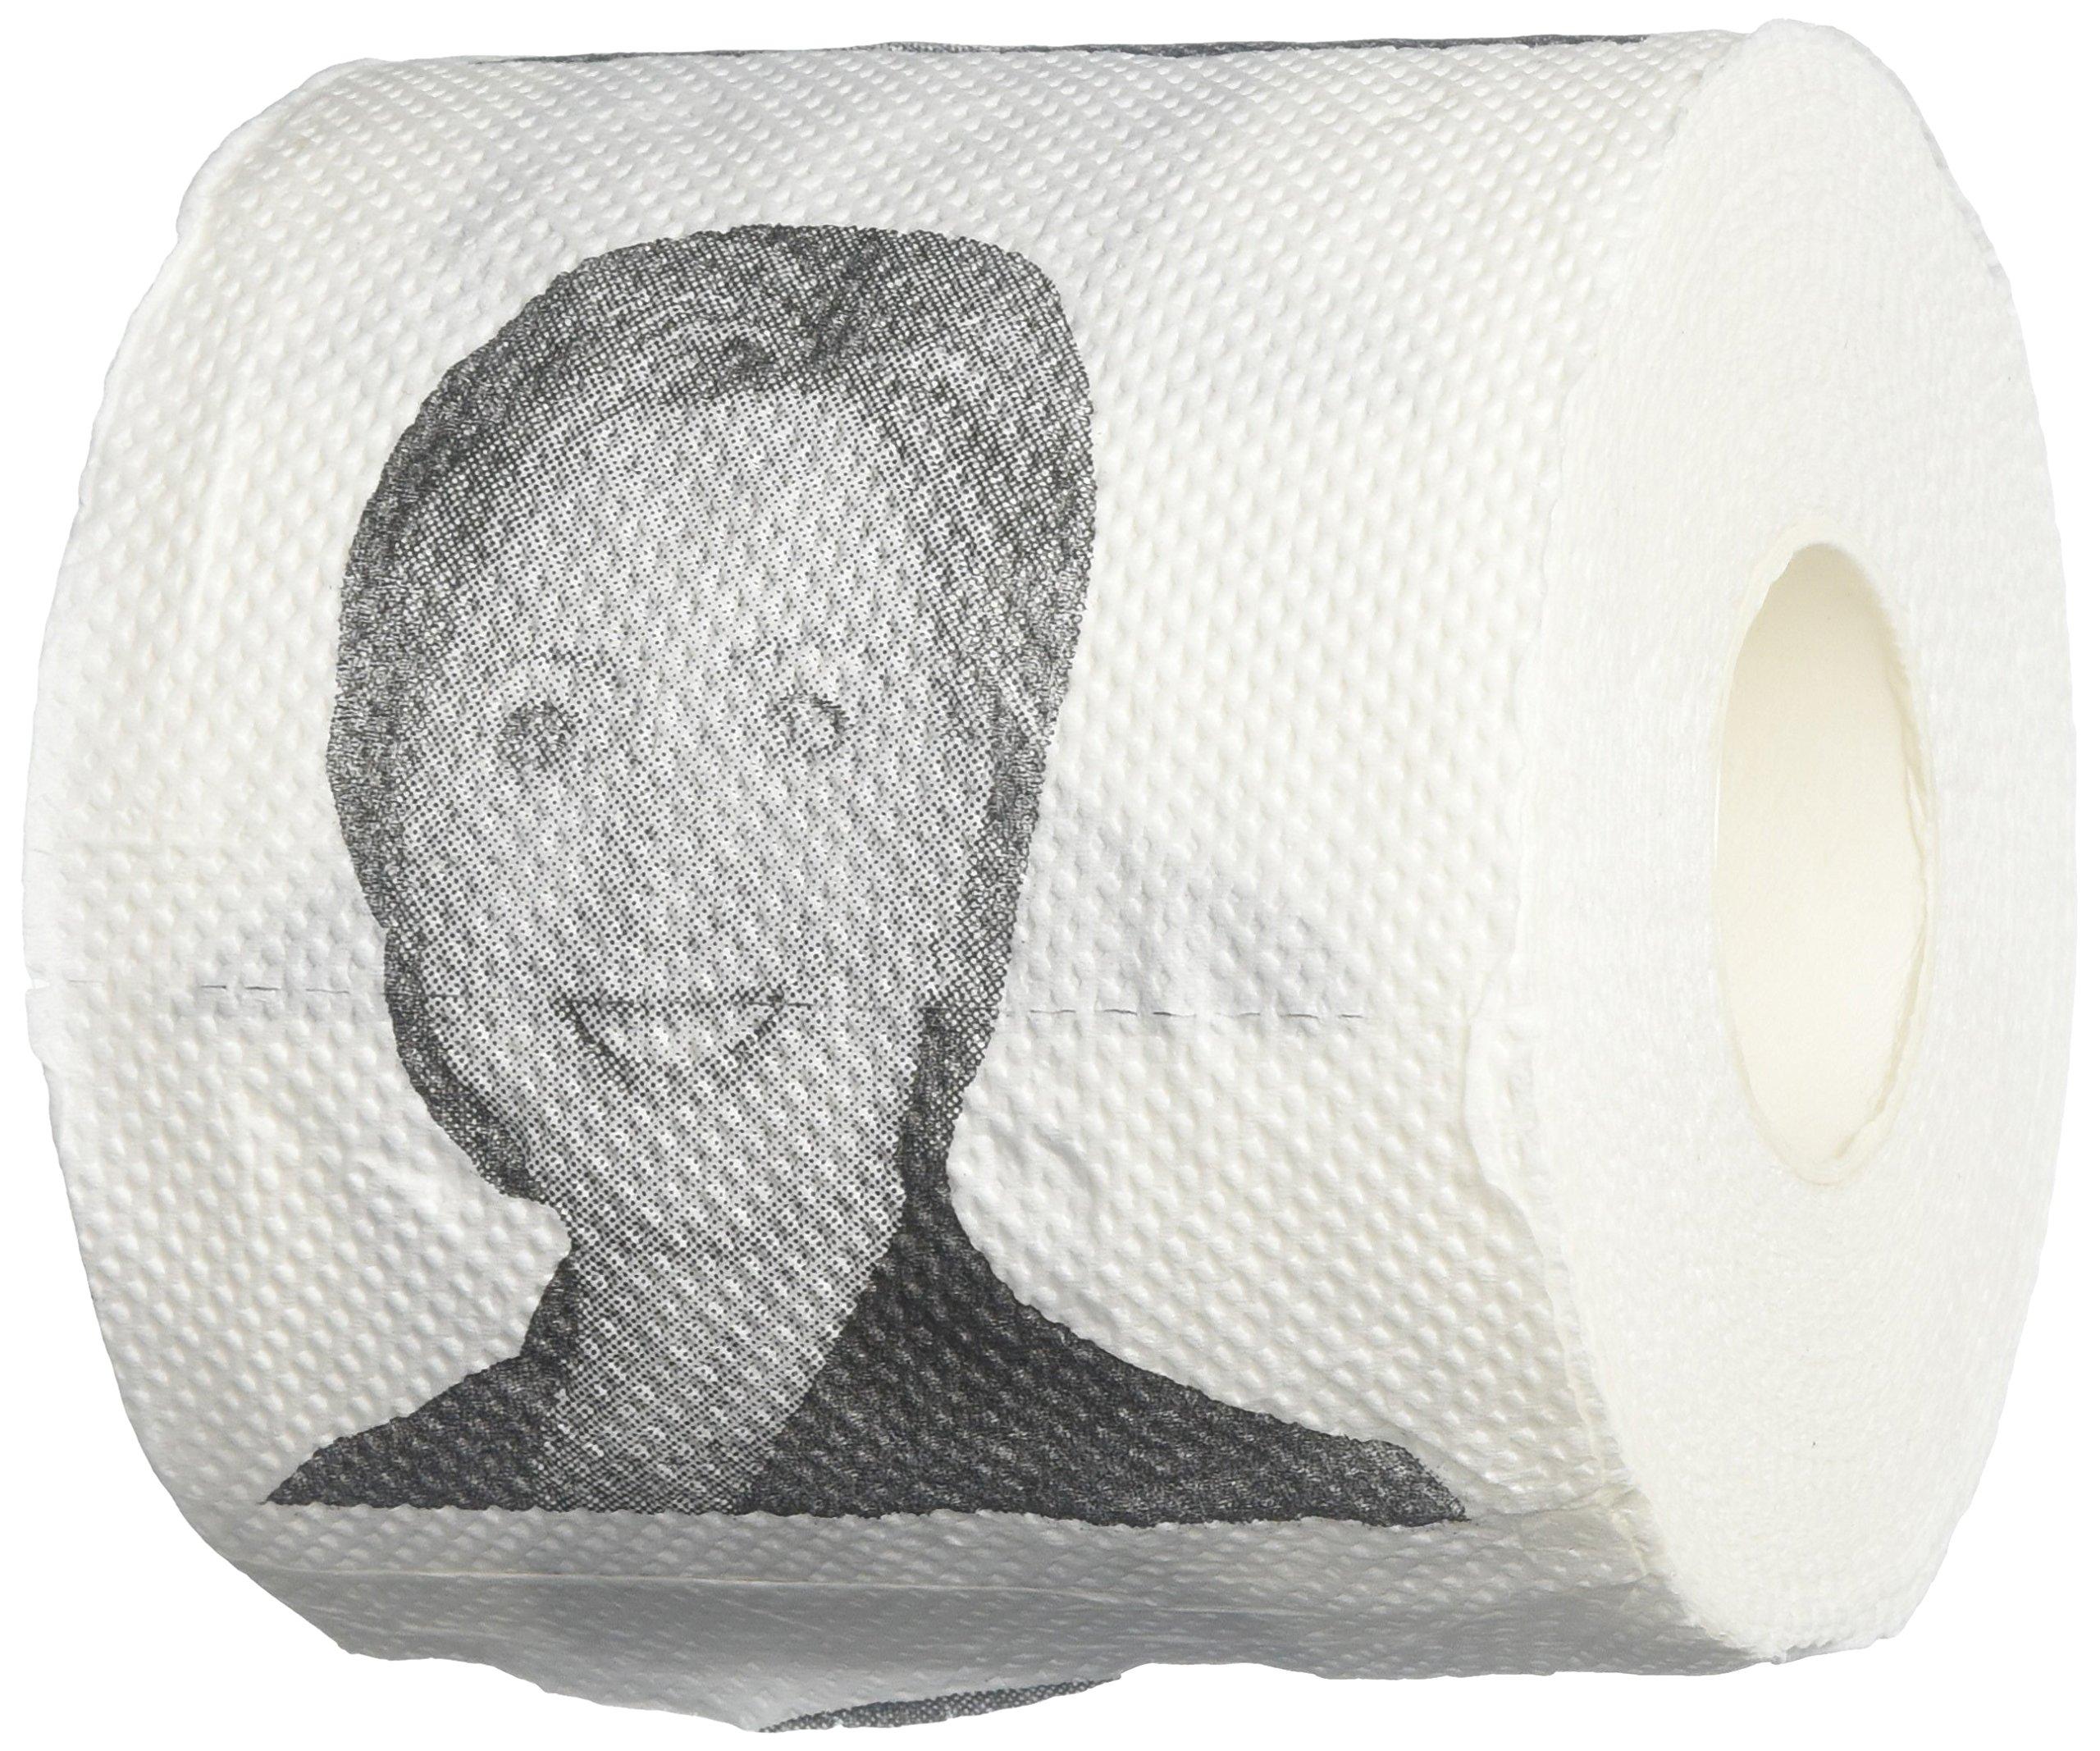 e33f44352c1 Amazon.com: Hillary Clinton Toilet Paper, Novelty Political Gag Gift (1):  Health & Personal Care